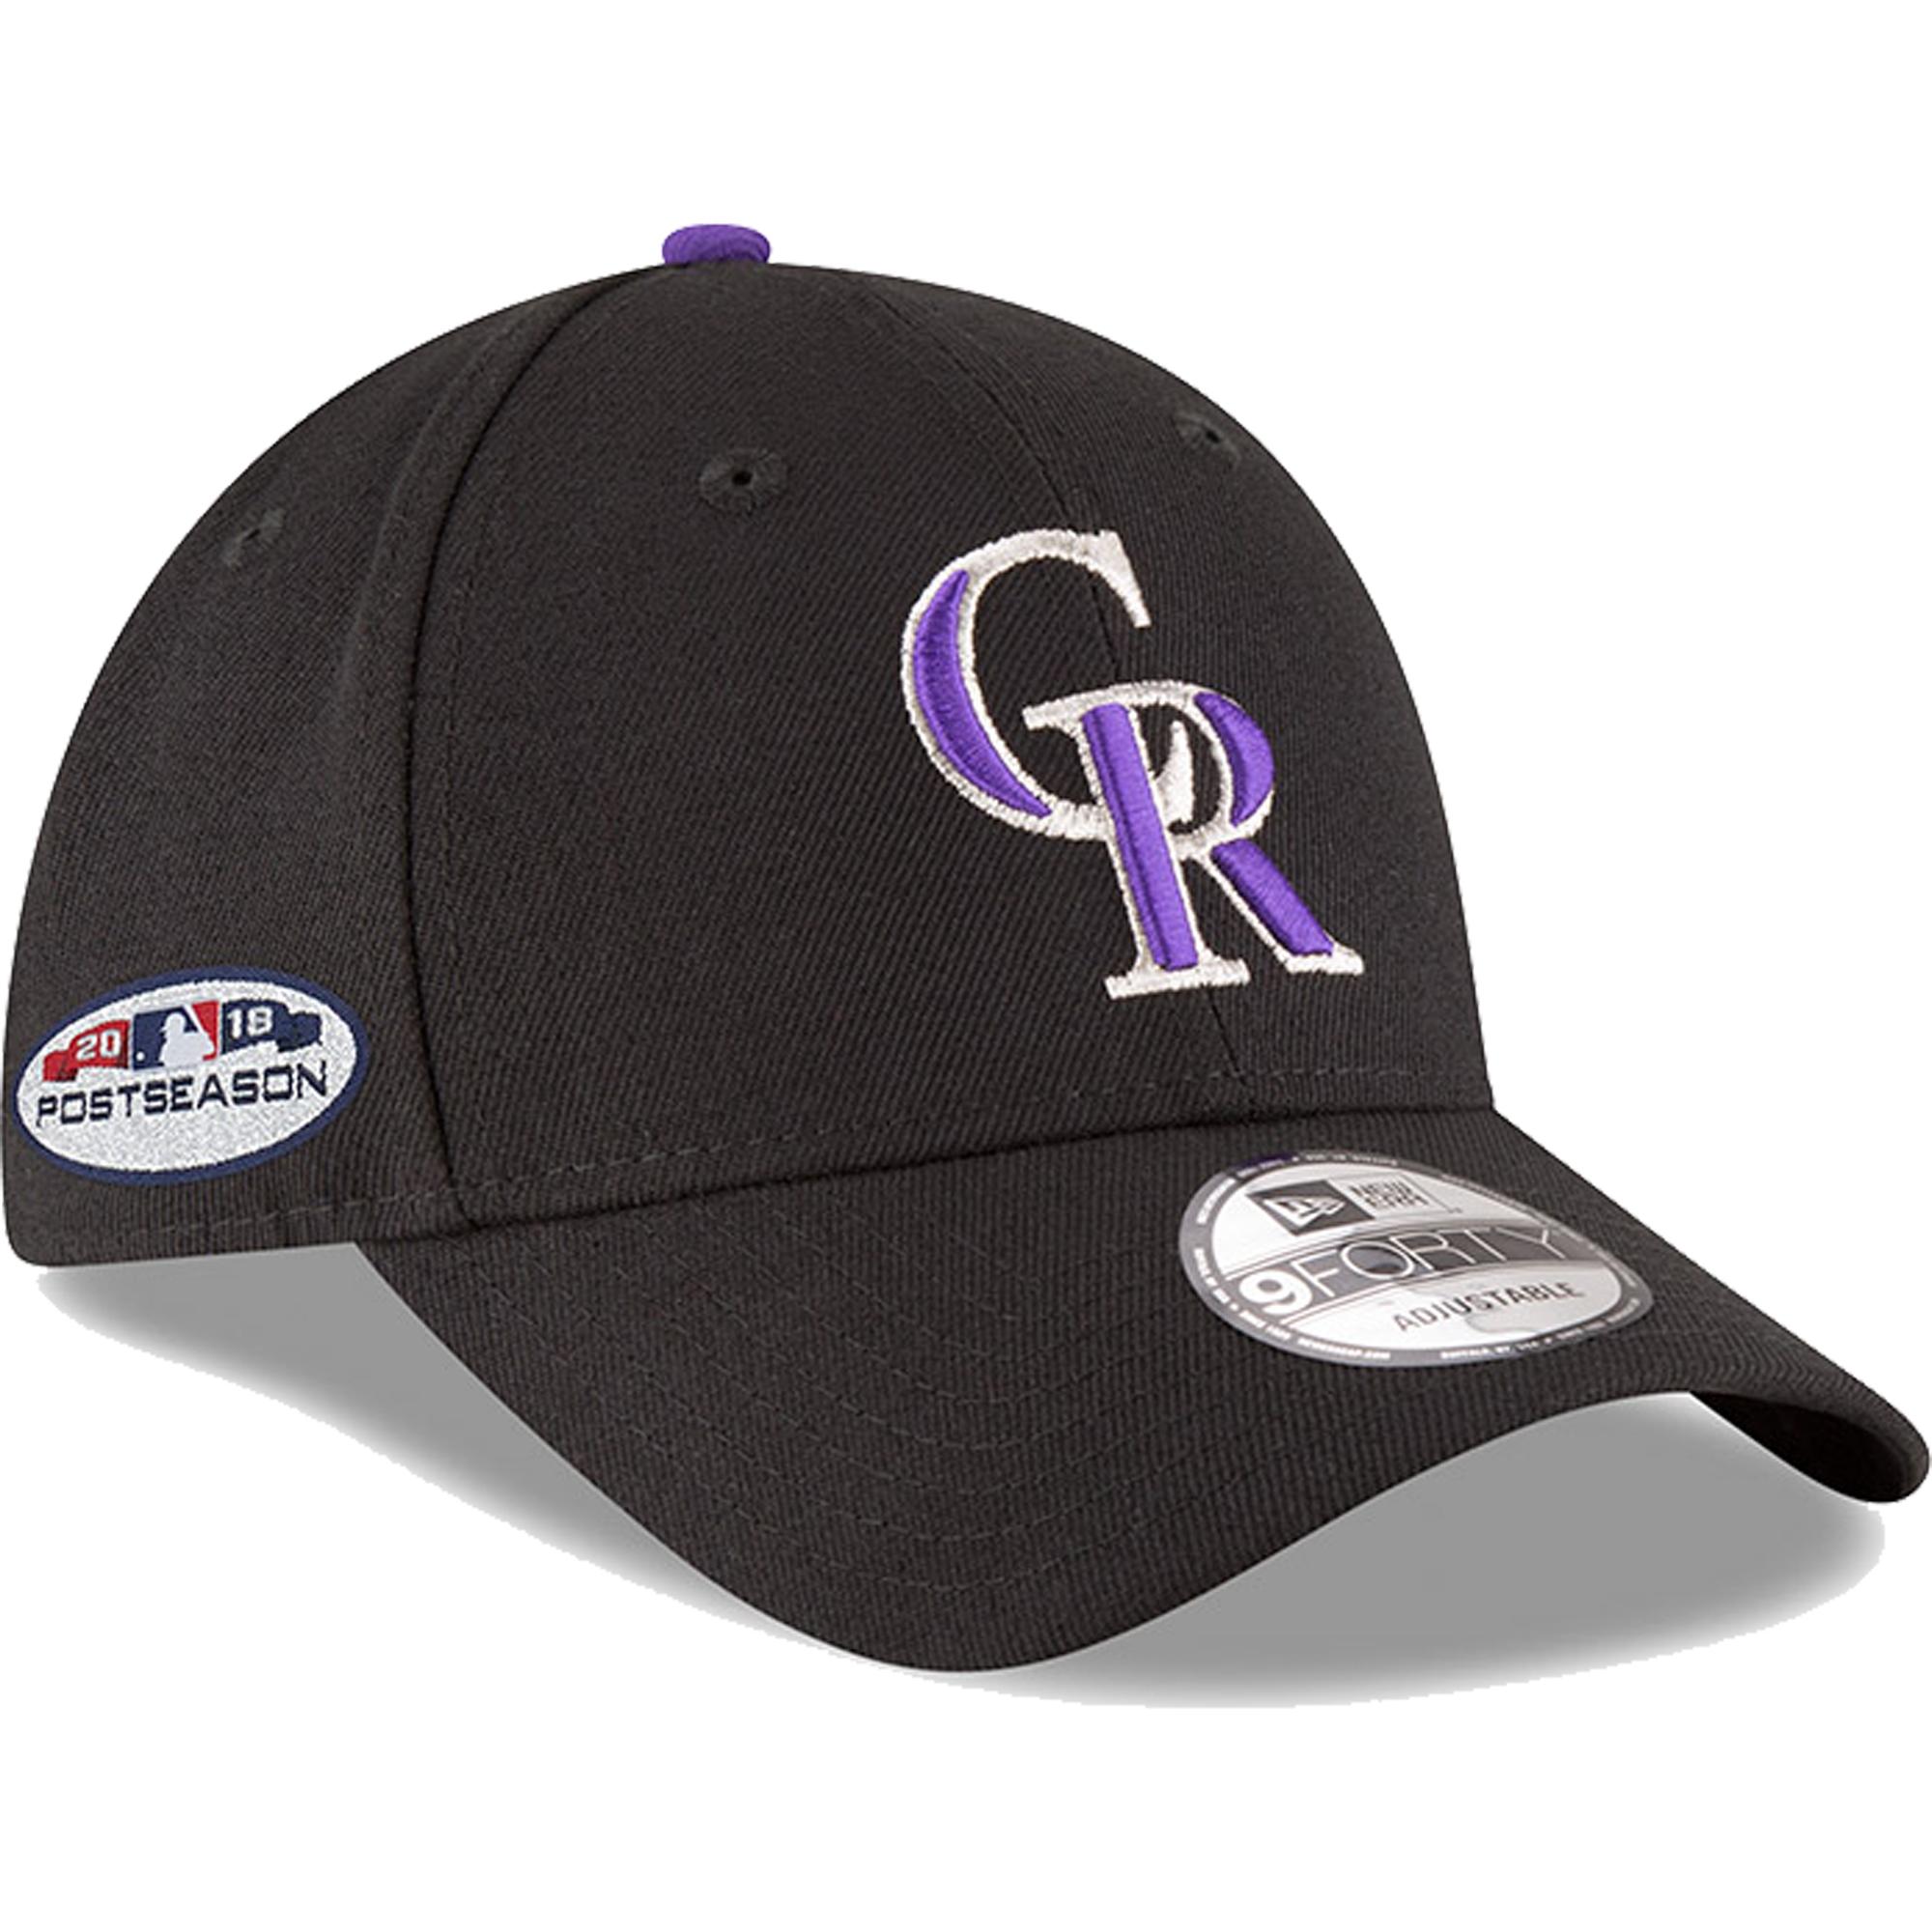 Colorado Rockies New Era 2018 Postseason Side Patch 9FORTY Adjustable Hat - Black - OSFA